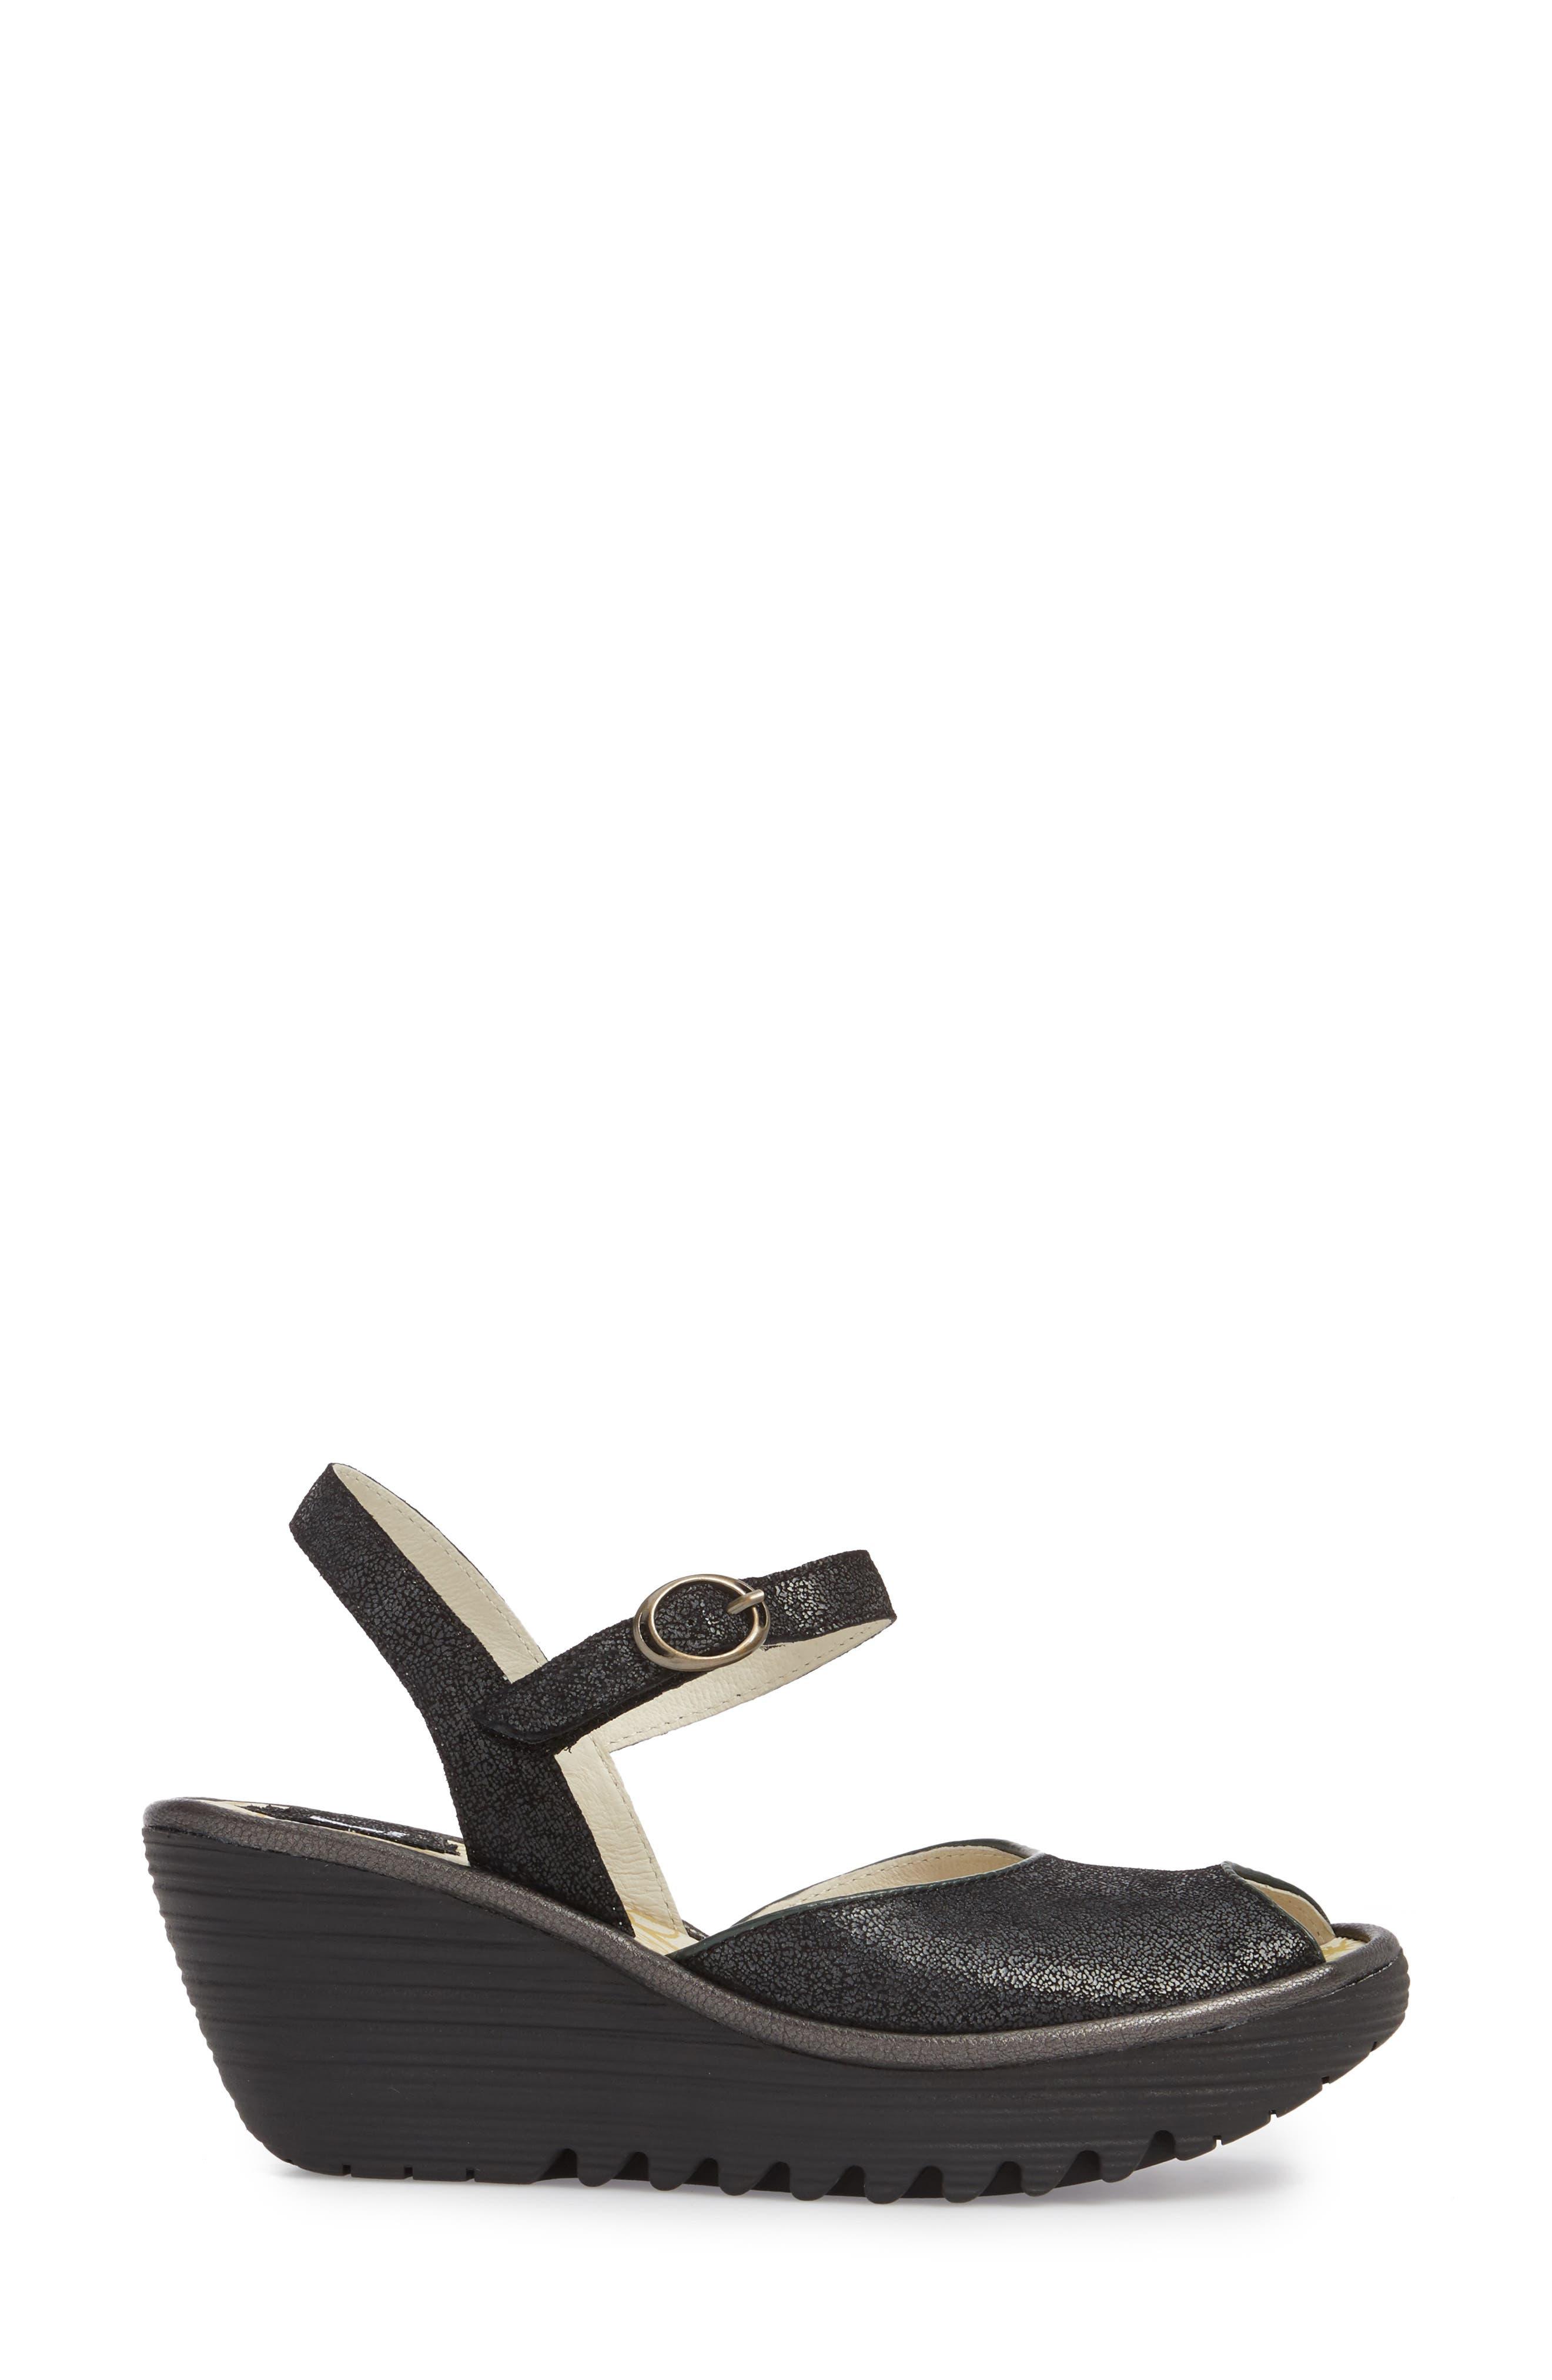 Yora Wedge Sandal,                             Alternate thumbnail 3, color,                             Black/ Graphite Leather